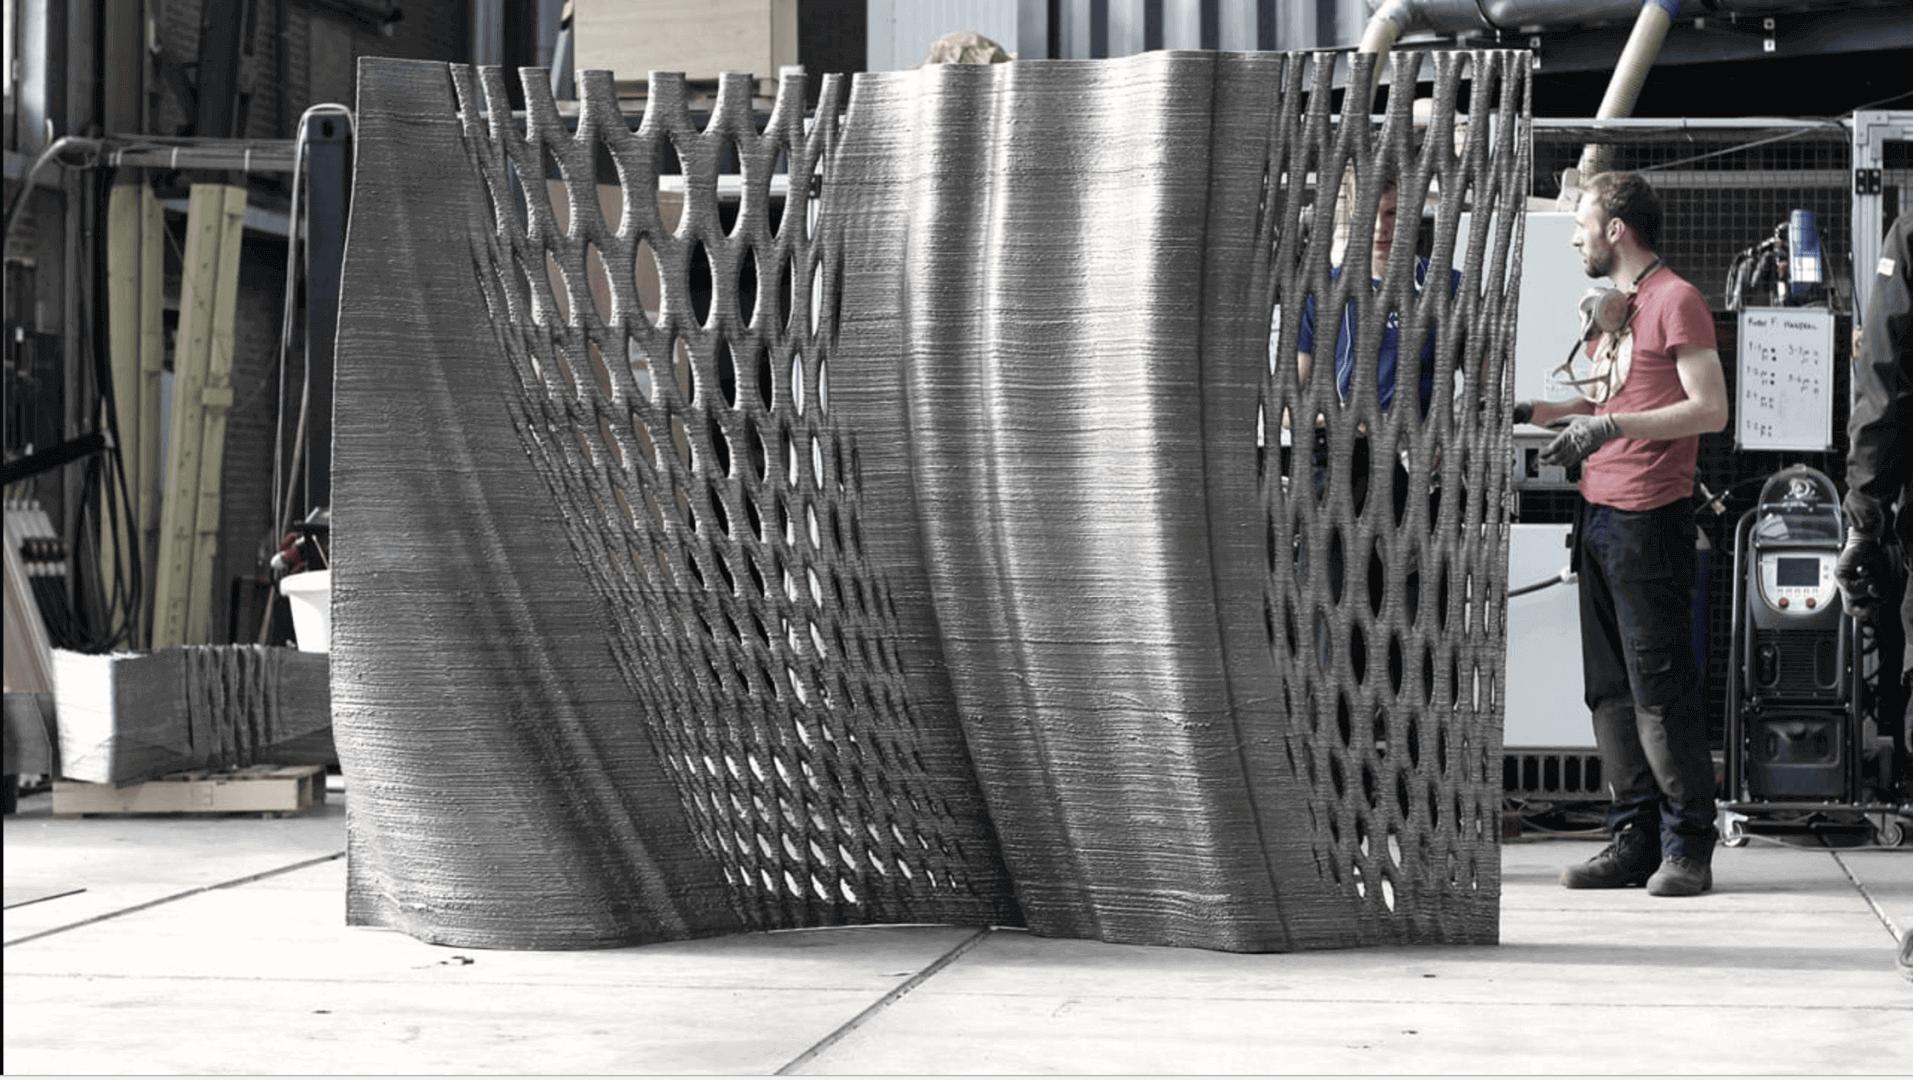 MX3D's Long-Awaited 3D Printed Bridge Project Evolves & Progresses On | All3DP